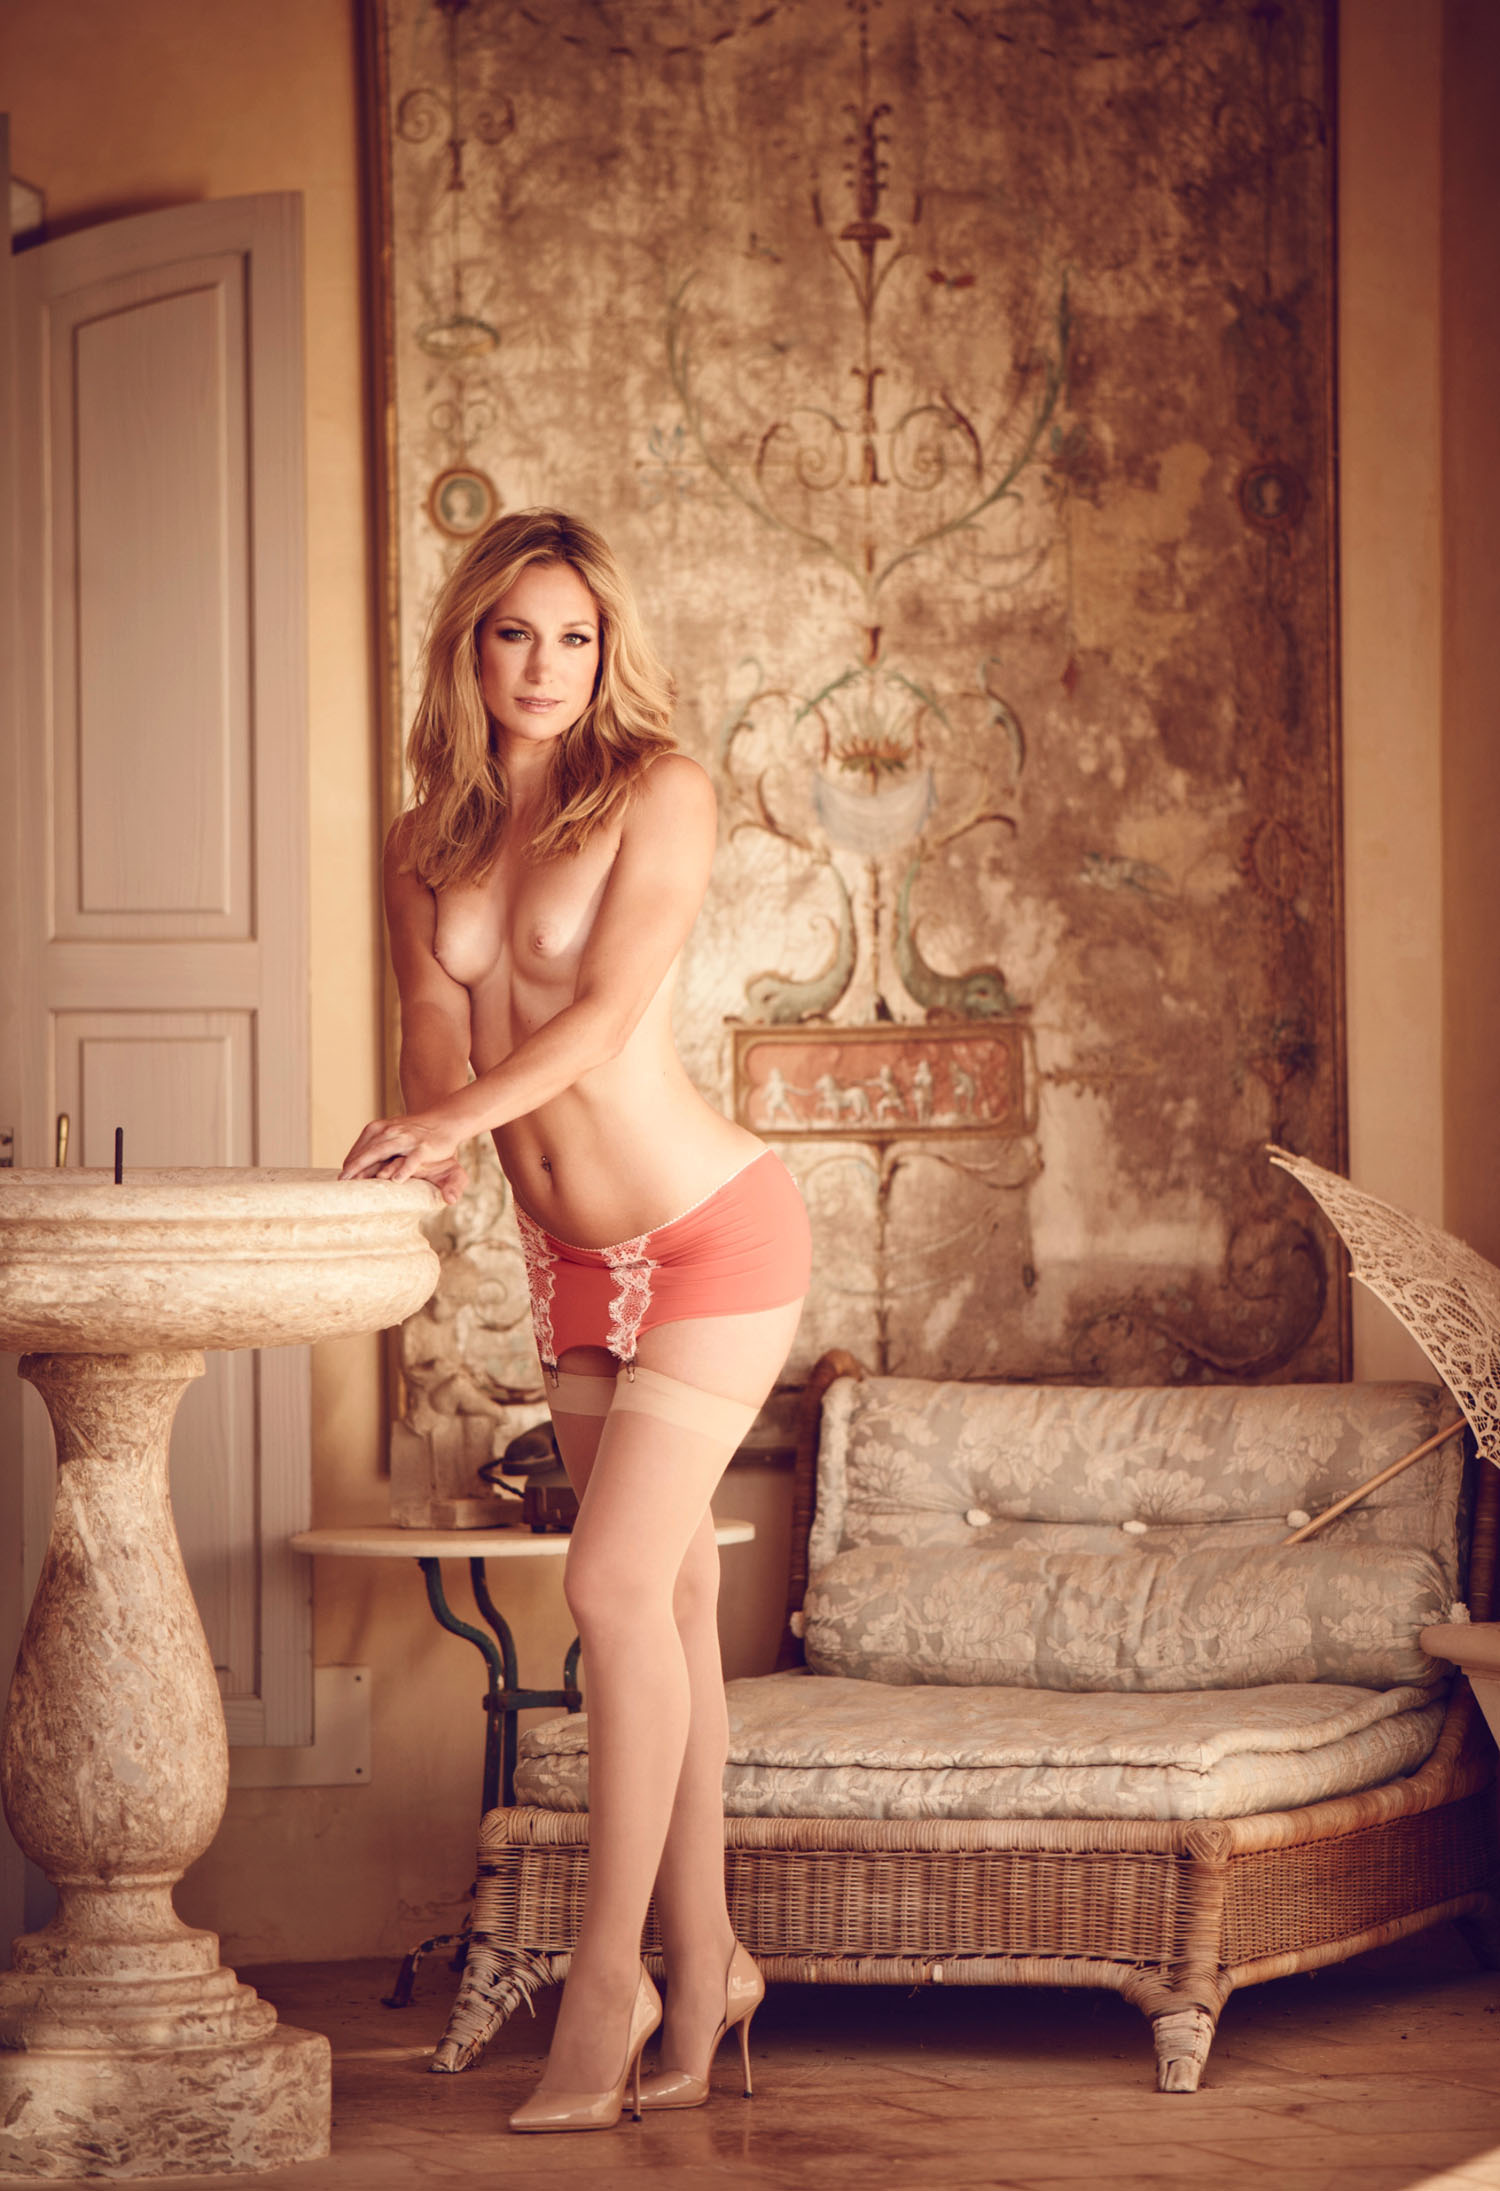 Кристин Тэйсс голая. Фото - 49